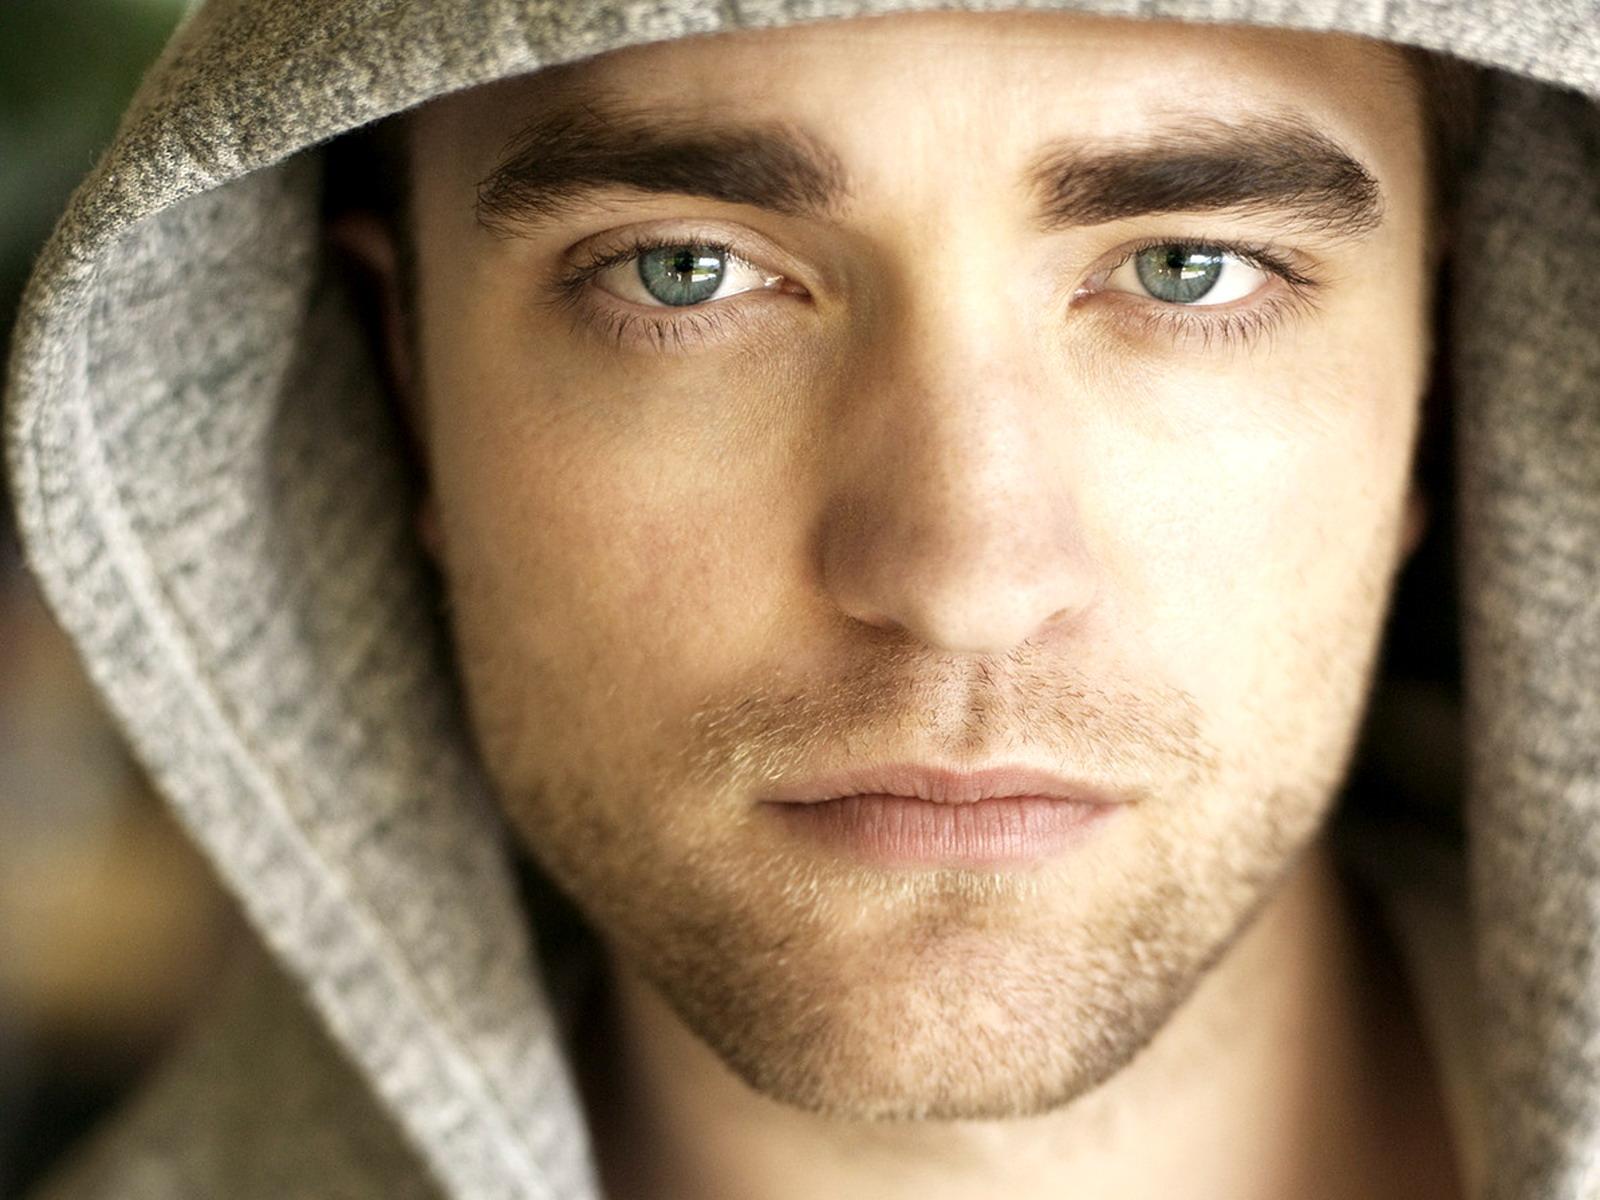 http://2.bp.blogspot.com/-H0fOx-j5kxs/TuIjMF0dn_I/AAAAAAAAFDc/VT_US-Xm6gg/s1600/Robert-Pattinson1.jpg